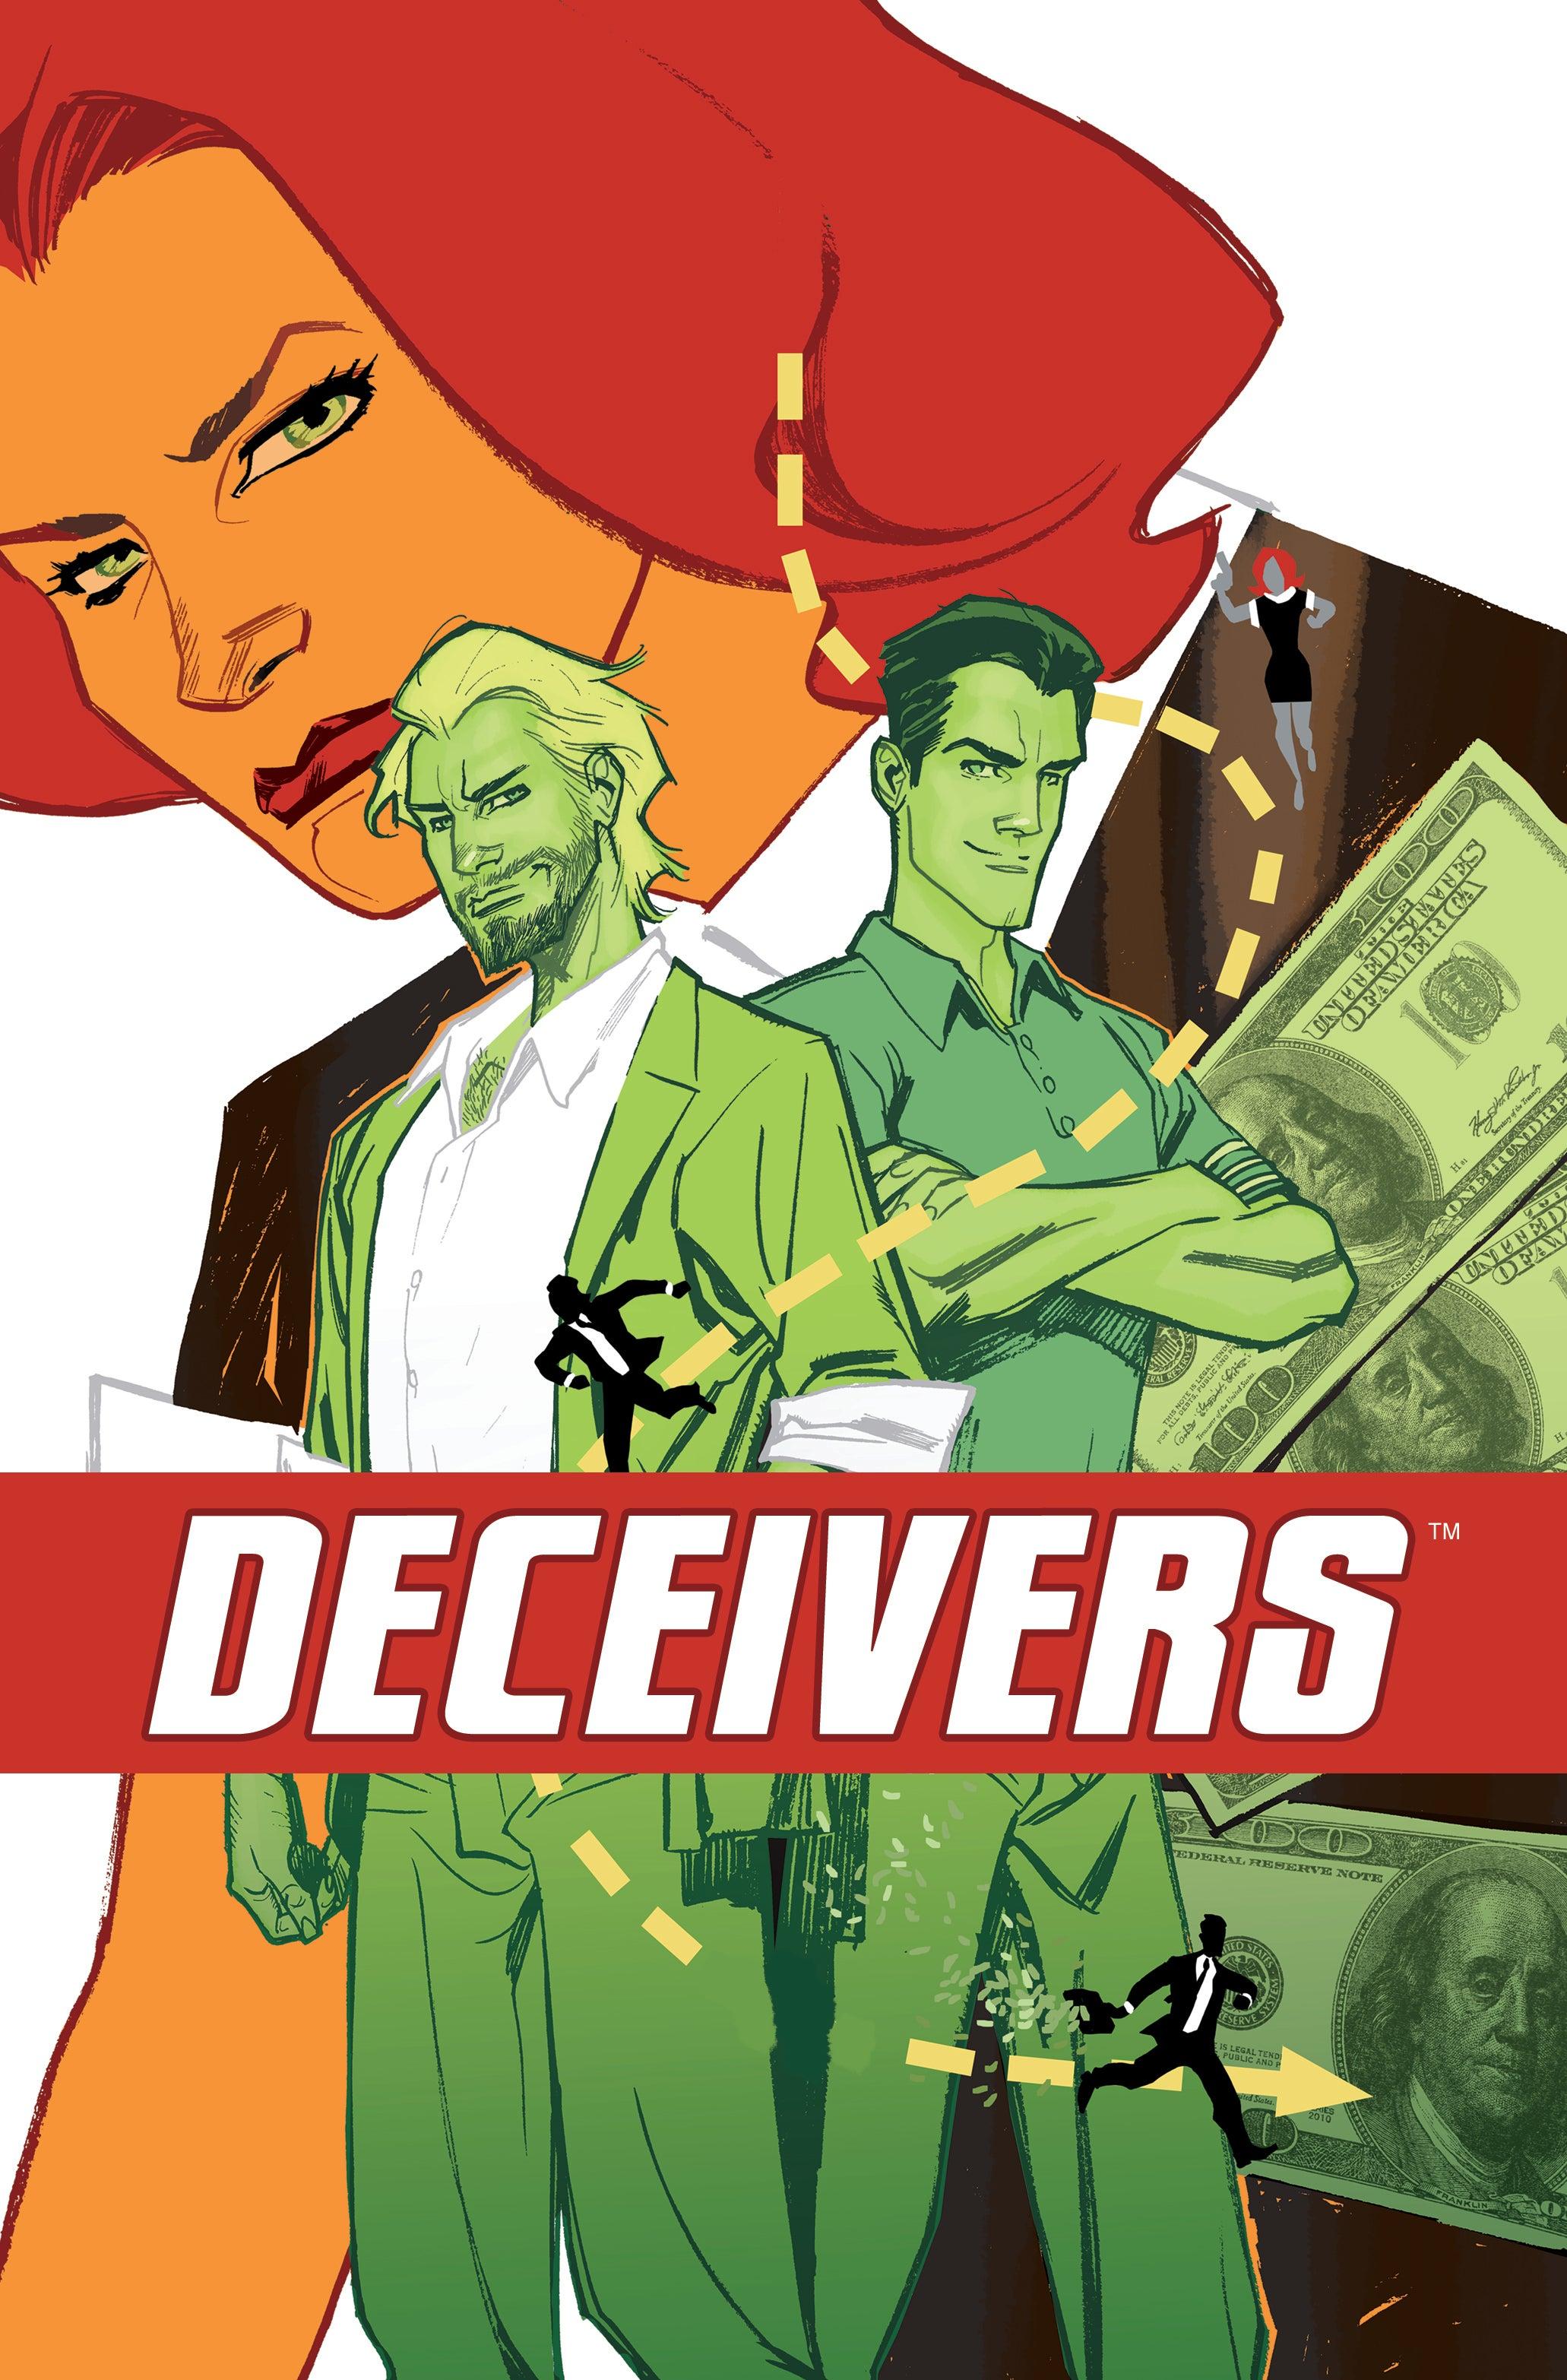 Deceivers_cvr_01